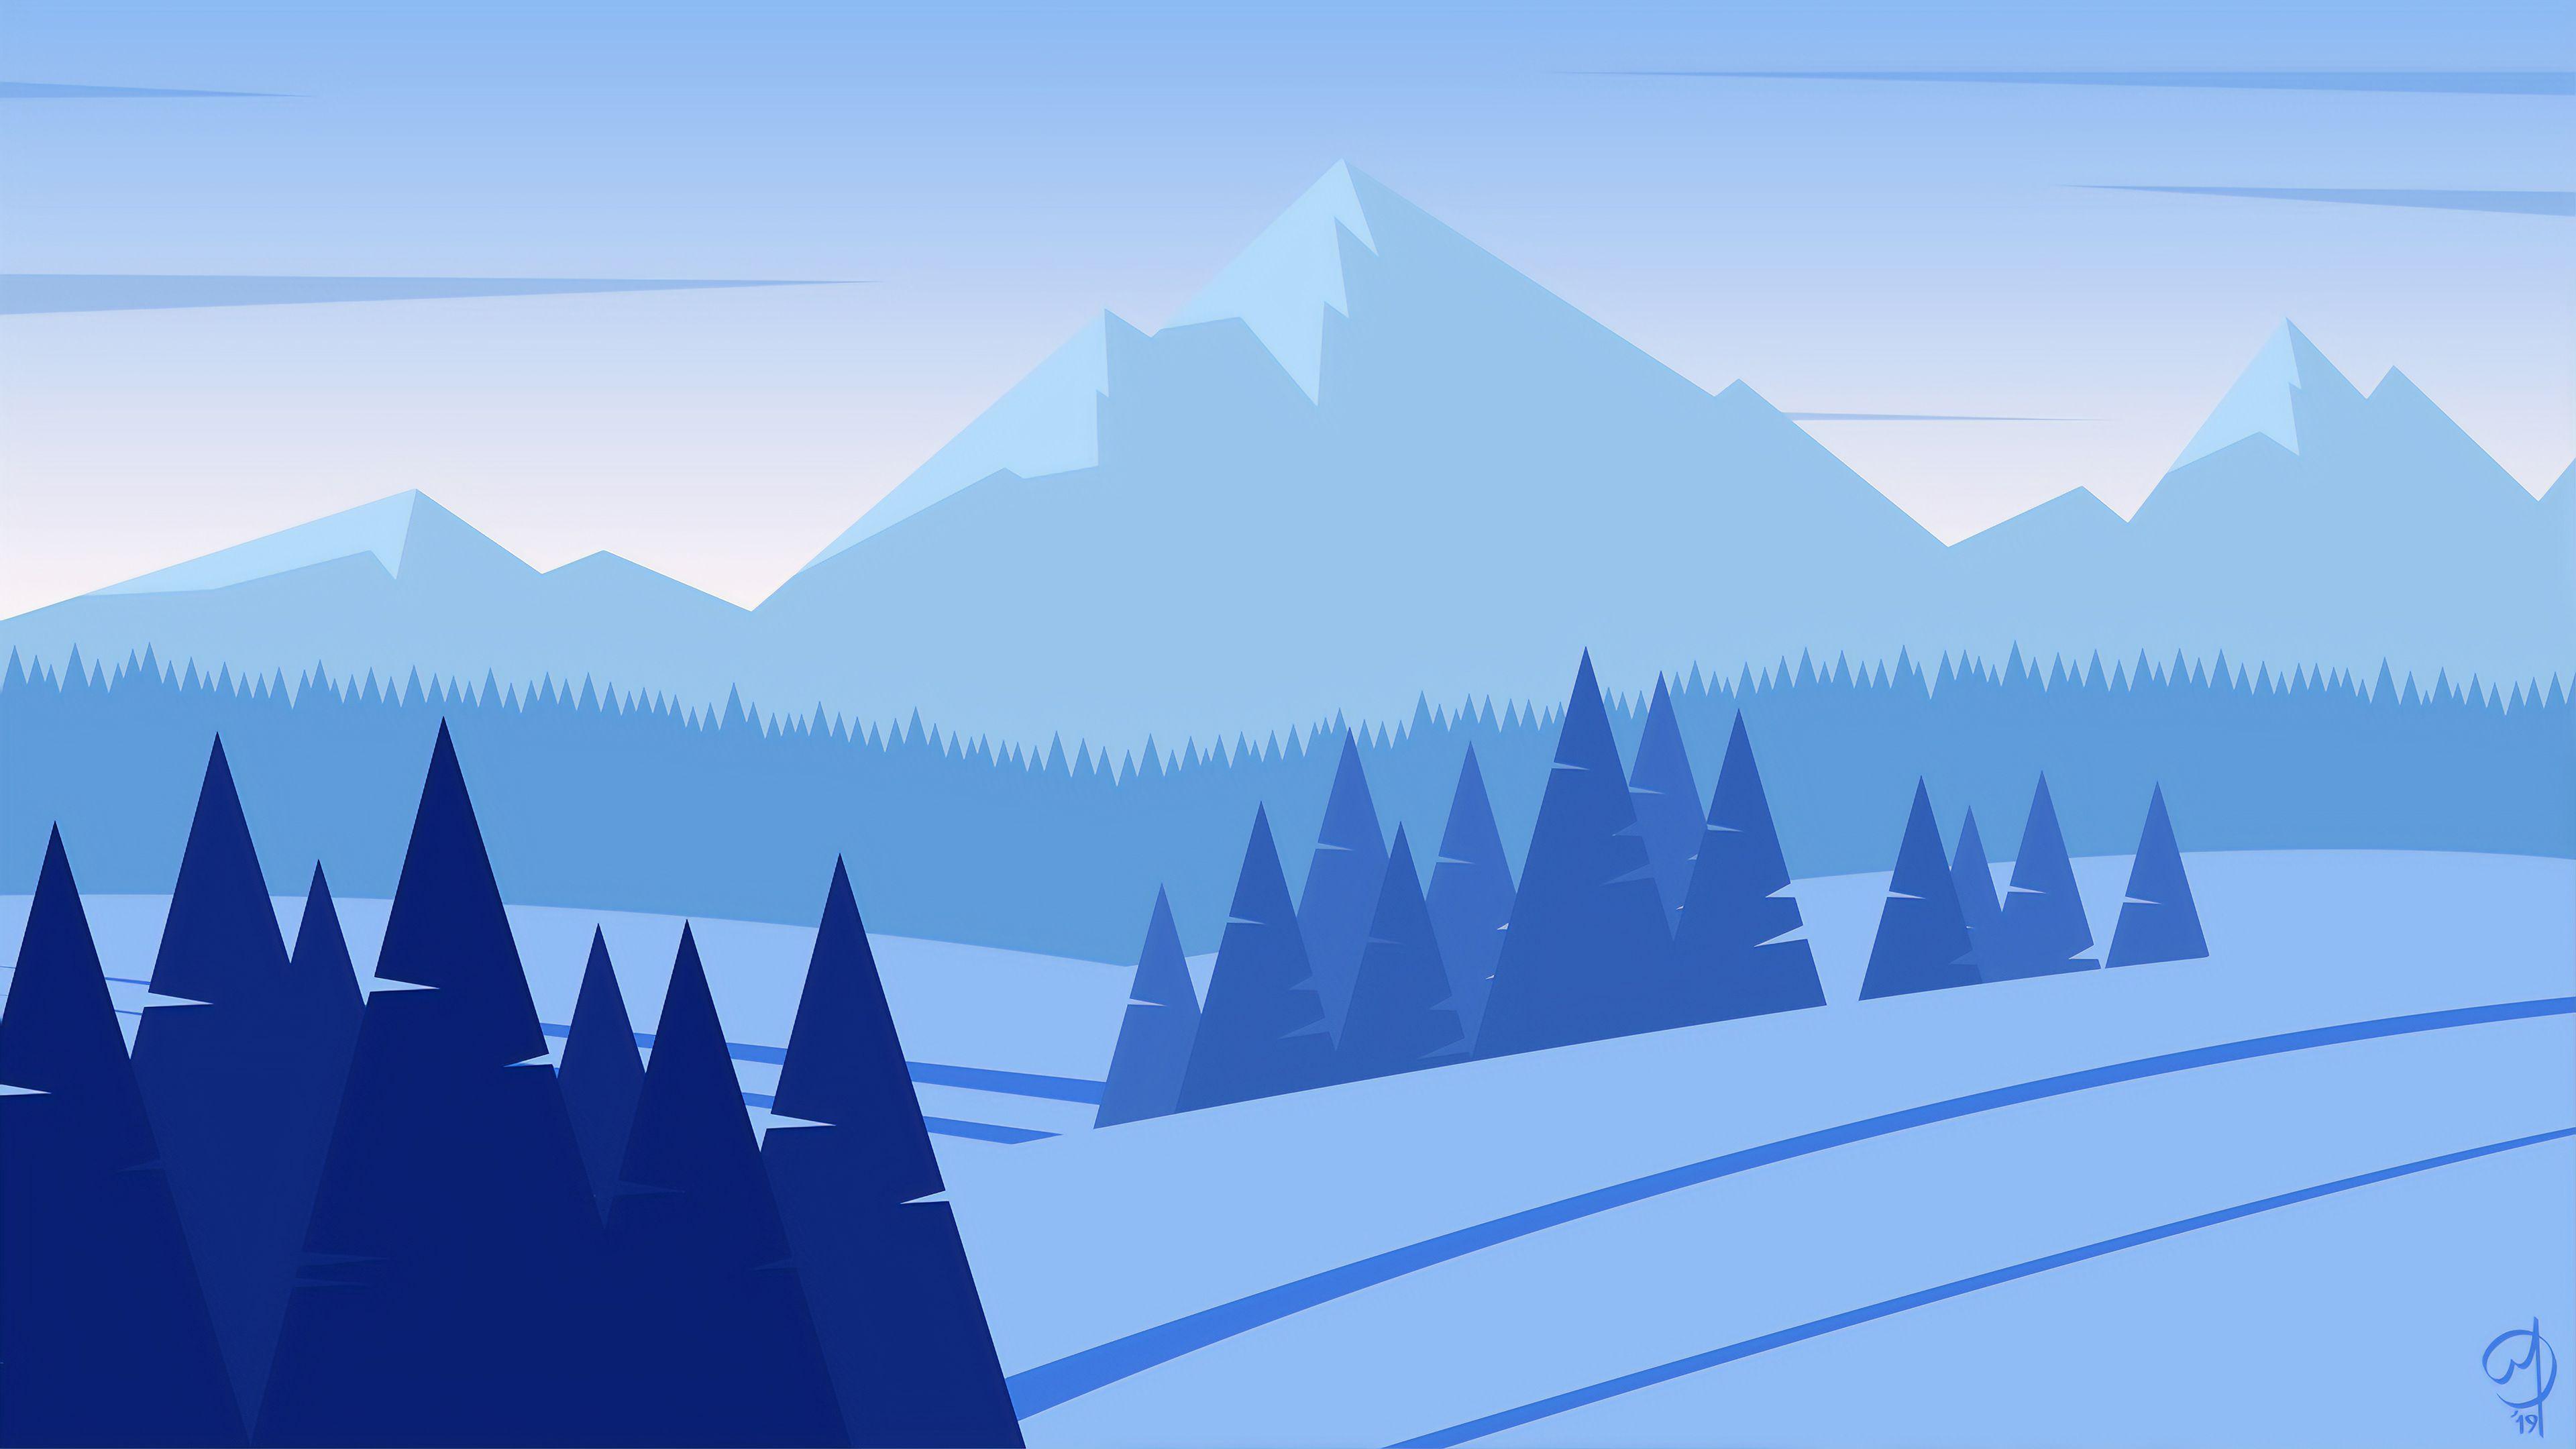 Snow Minimalist Wallpapers - Top Free Snow Minimalist ...